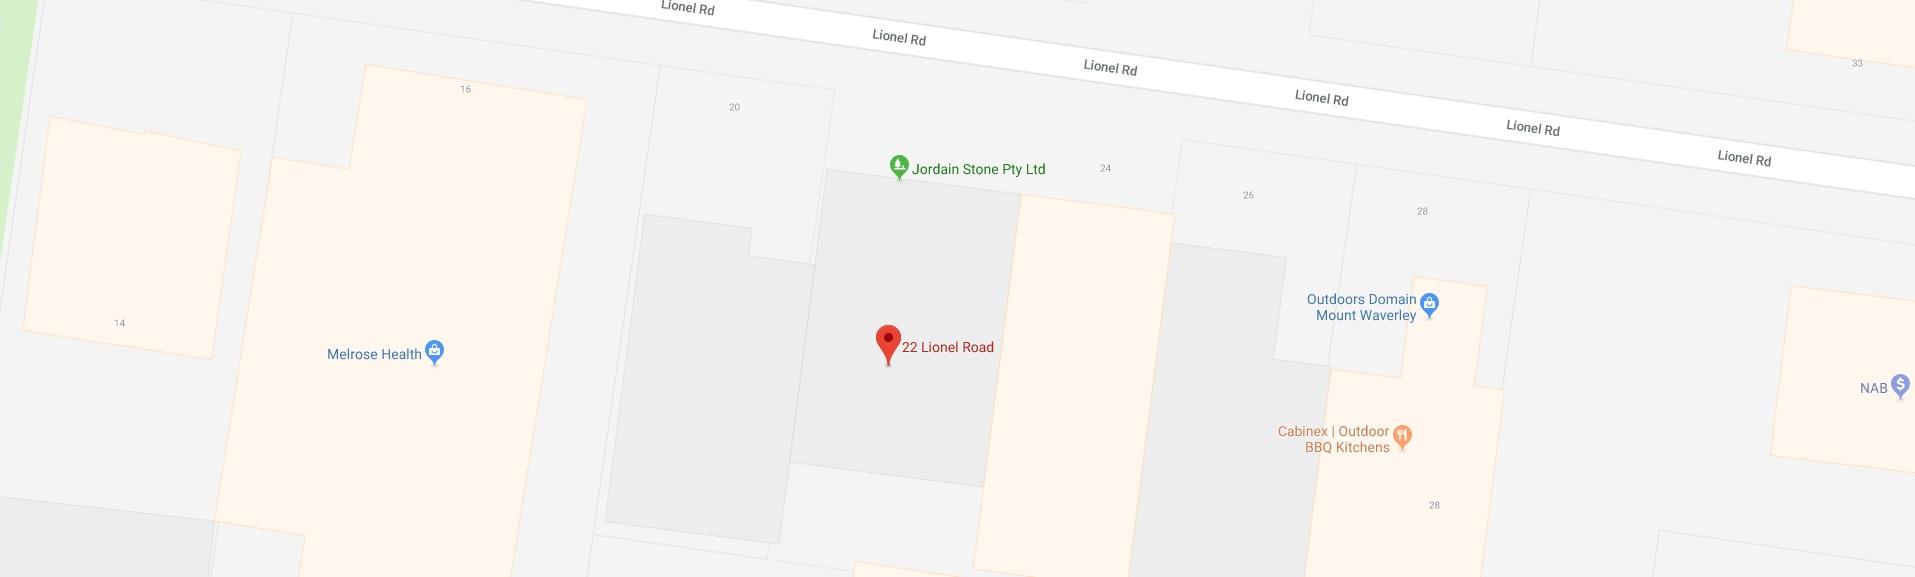 jordain location map